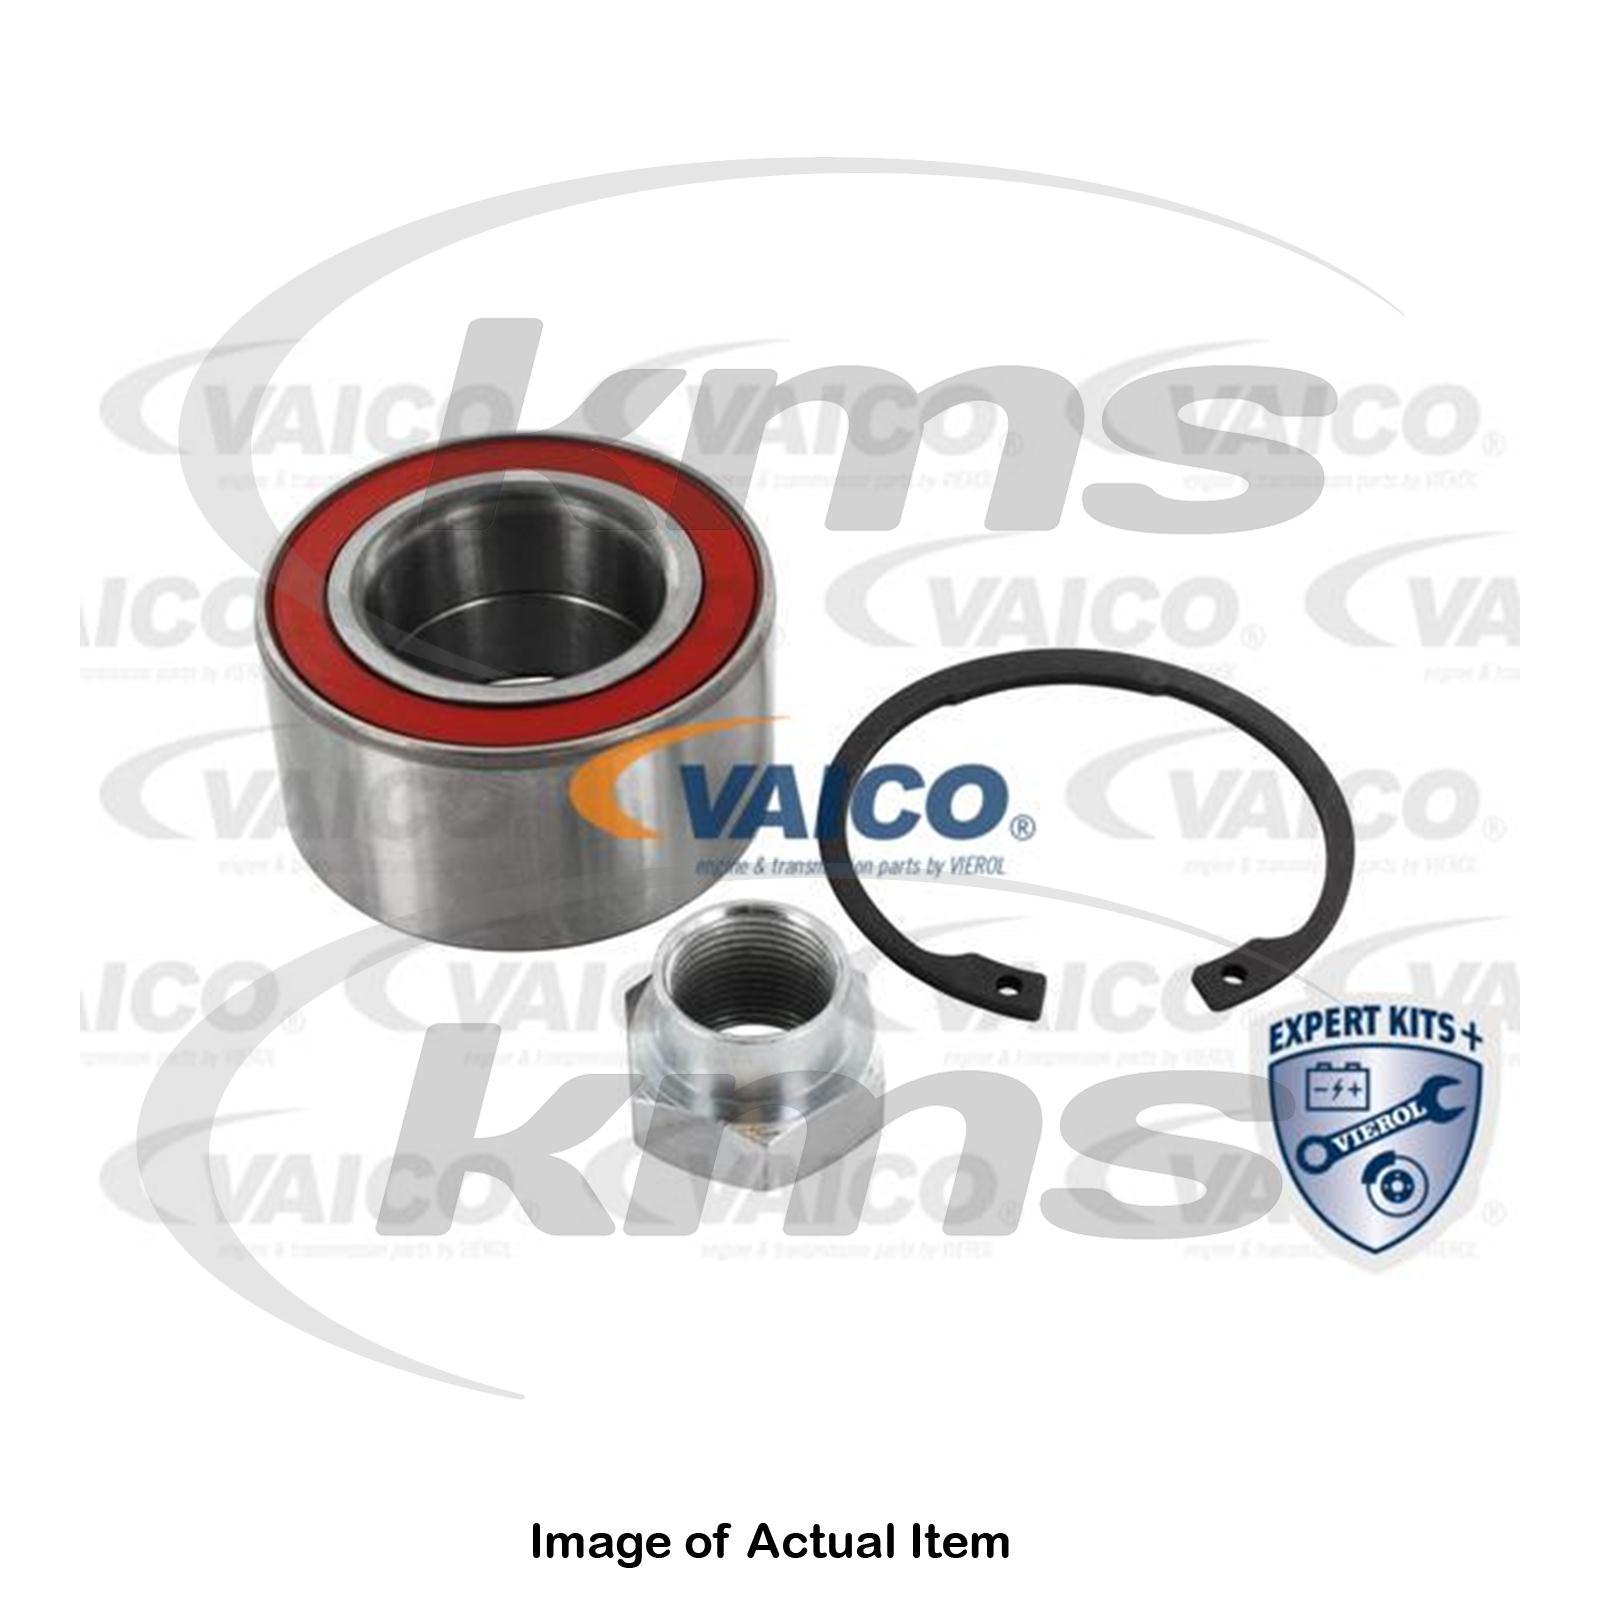 New Genuine Febi Bilstein Wheel Bearing Kit 07932 Top German Quality